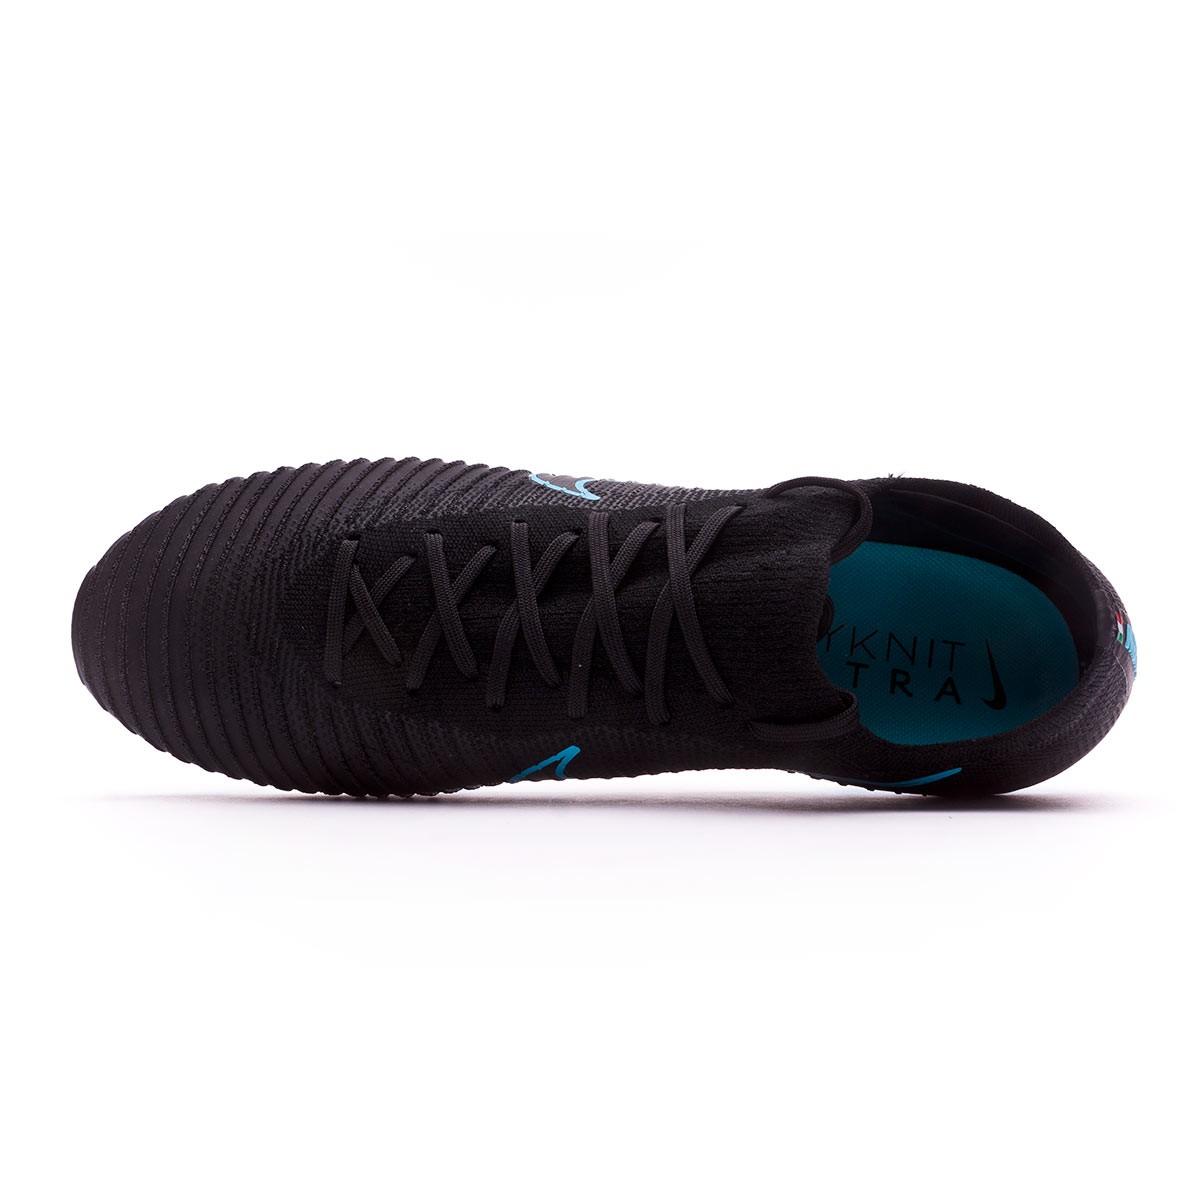 eb8a3e3f1d1107 Boot Nike Mercurial Vapor Flyknit Ultra FG Black-Gamma blue - Tienda de  fútbol Fútbol Emotion